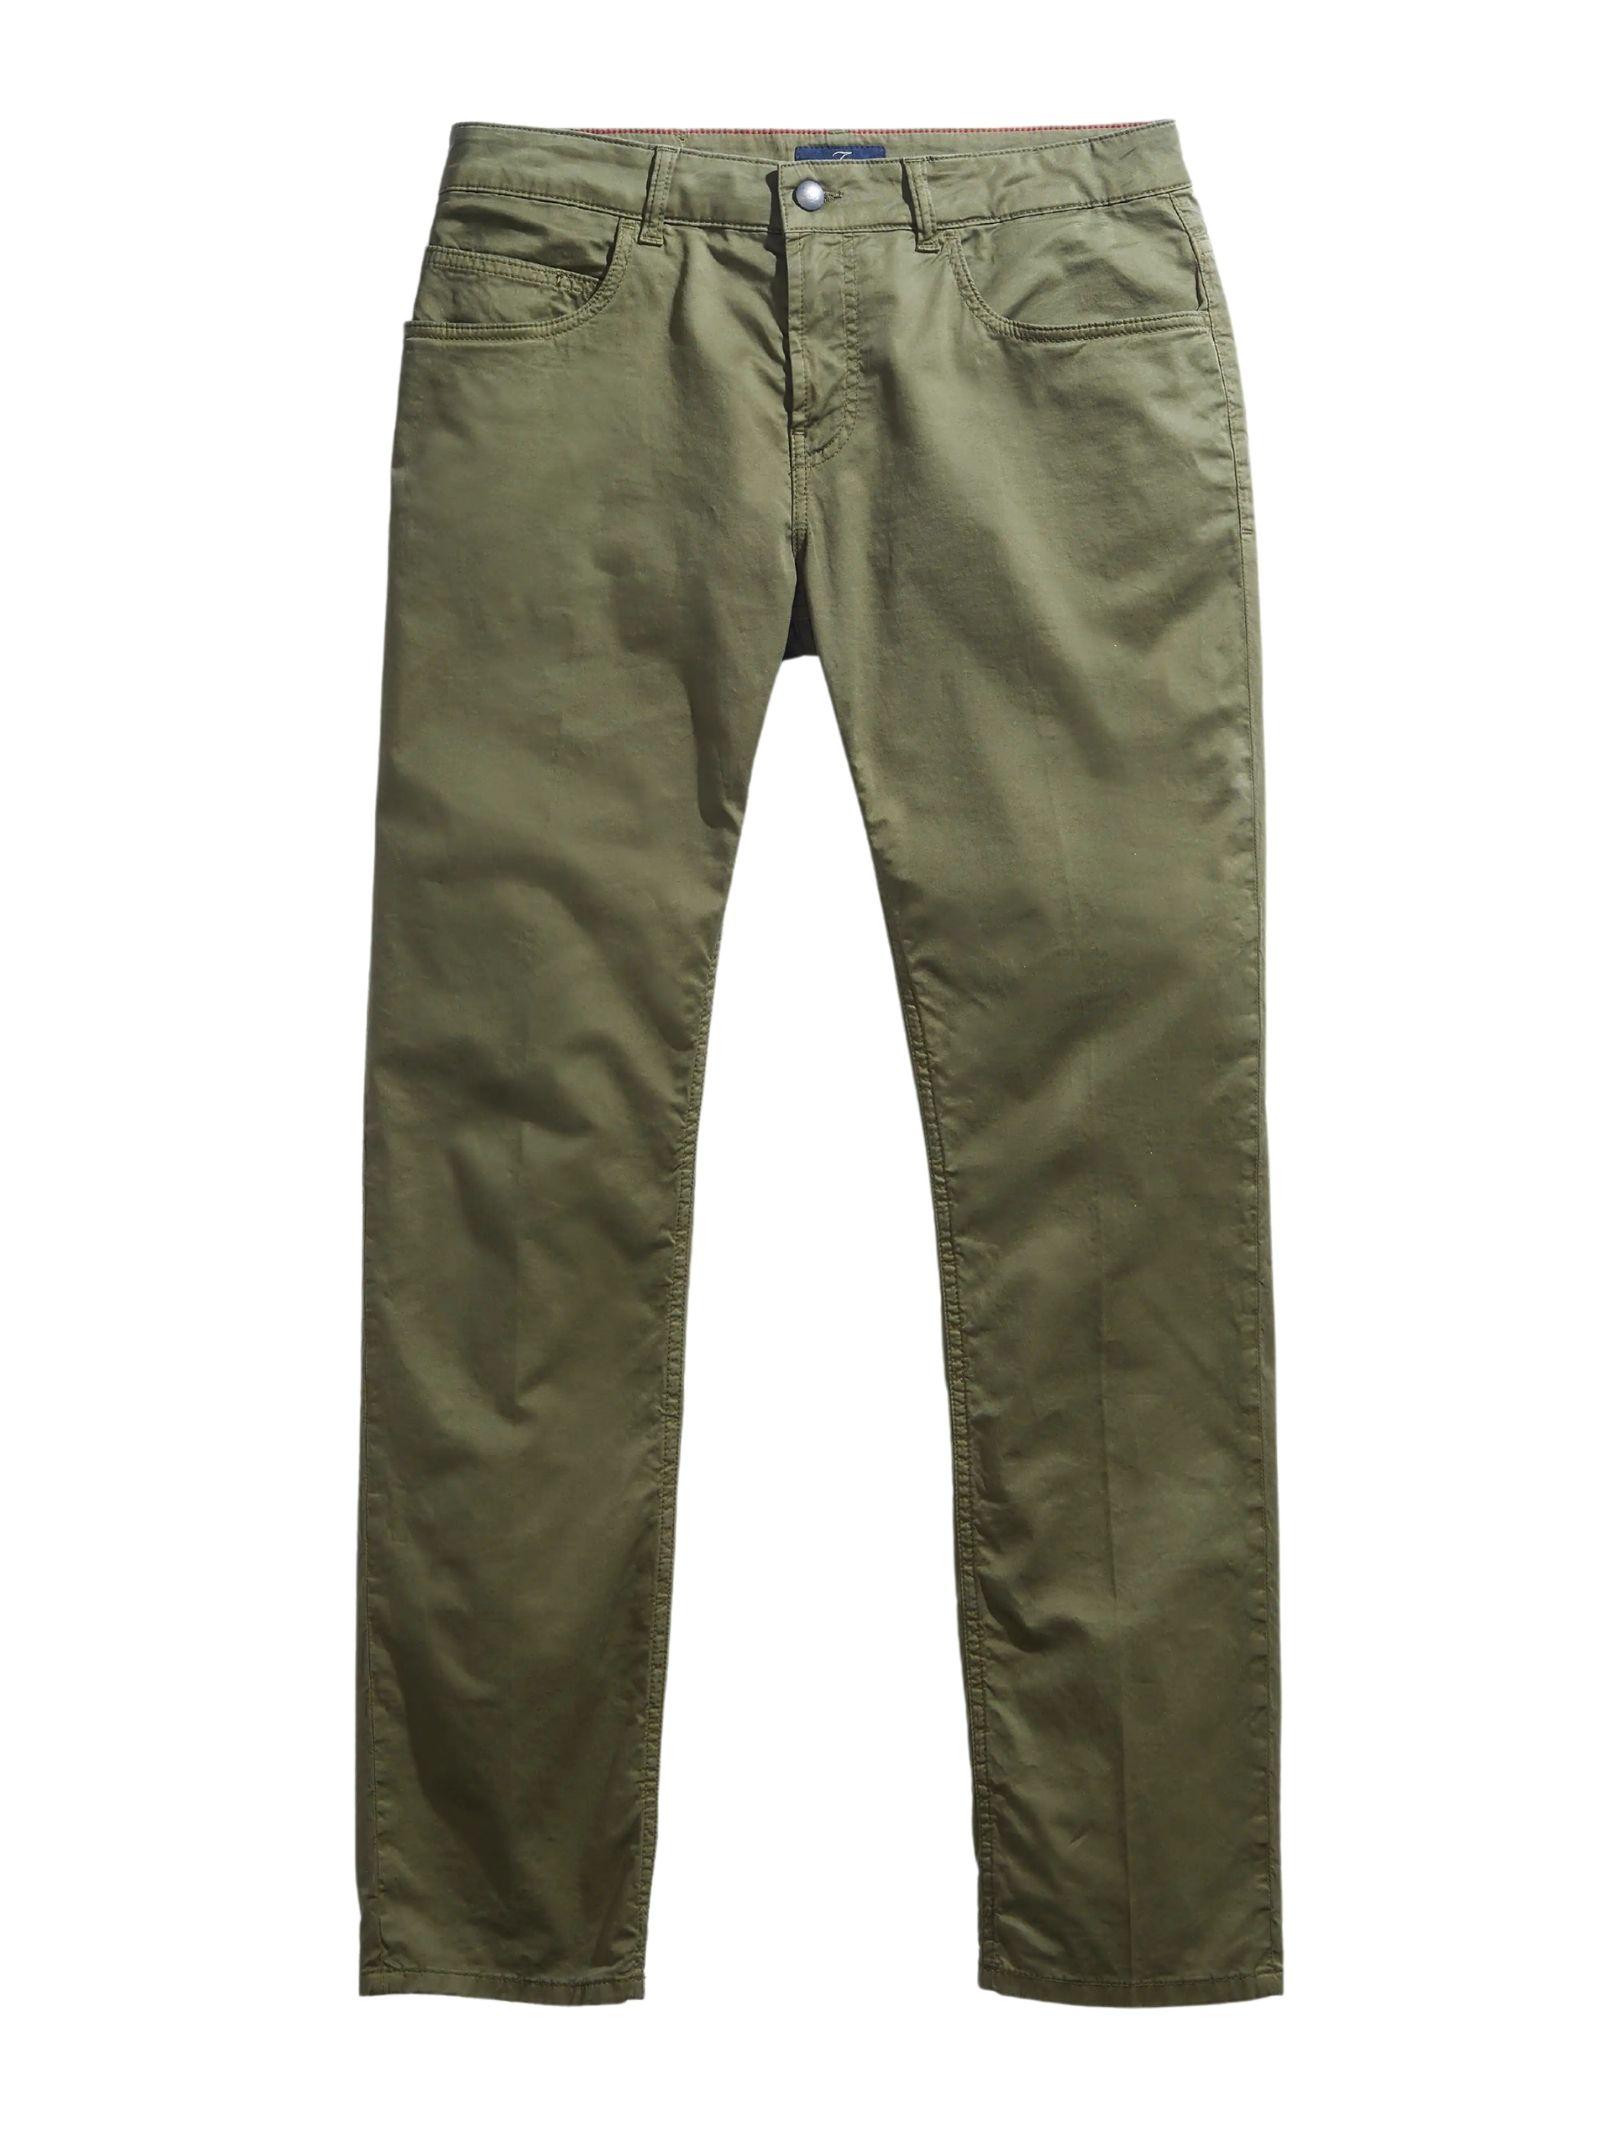 Pantalone 5 Tasche verde FAY | Pantalone | NTM8242180TGURV616